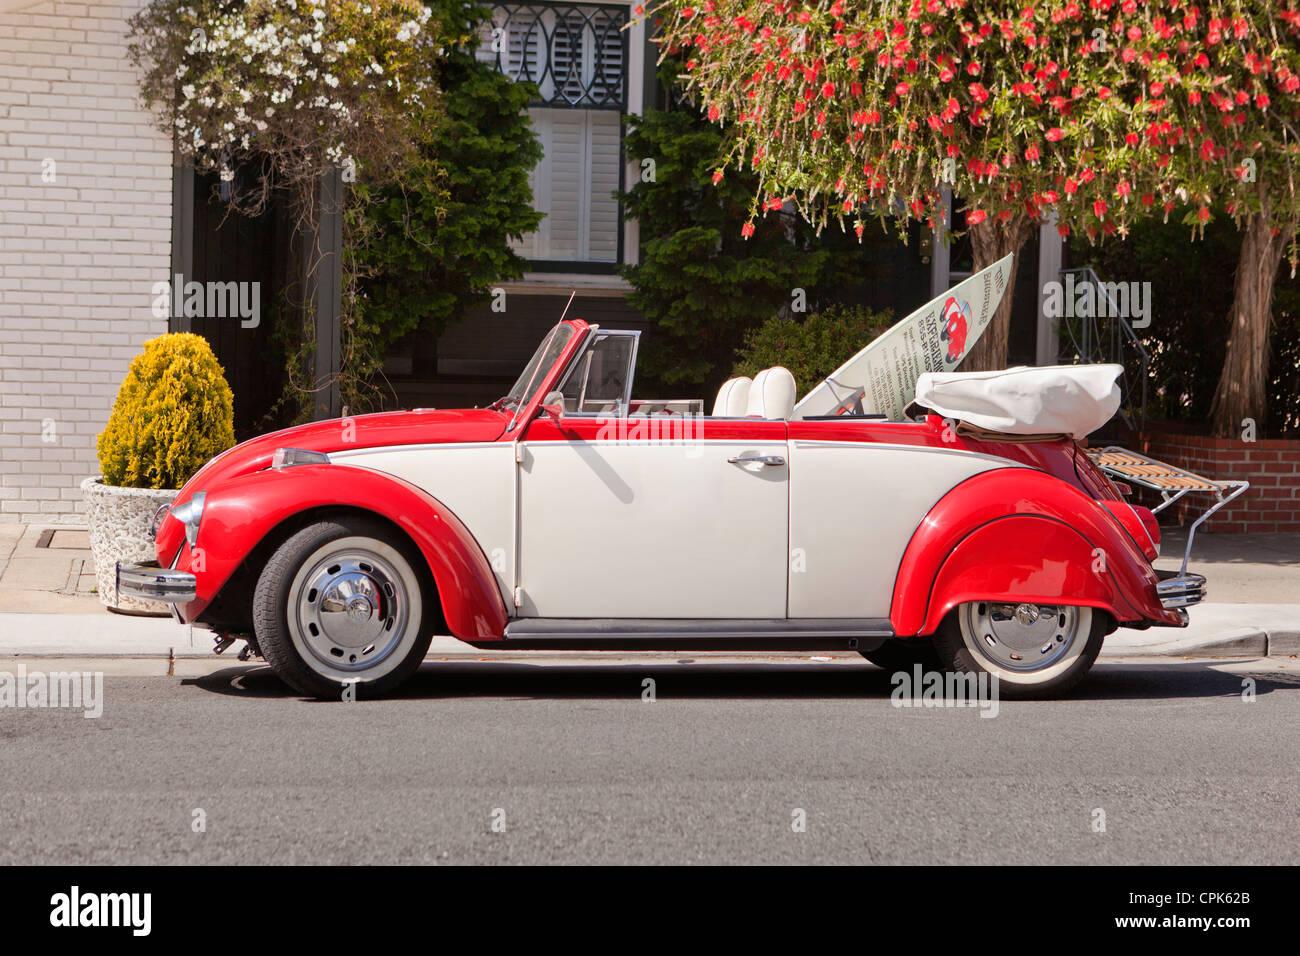 A vintage convertible Volkswagen beetle - Stock Image